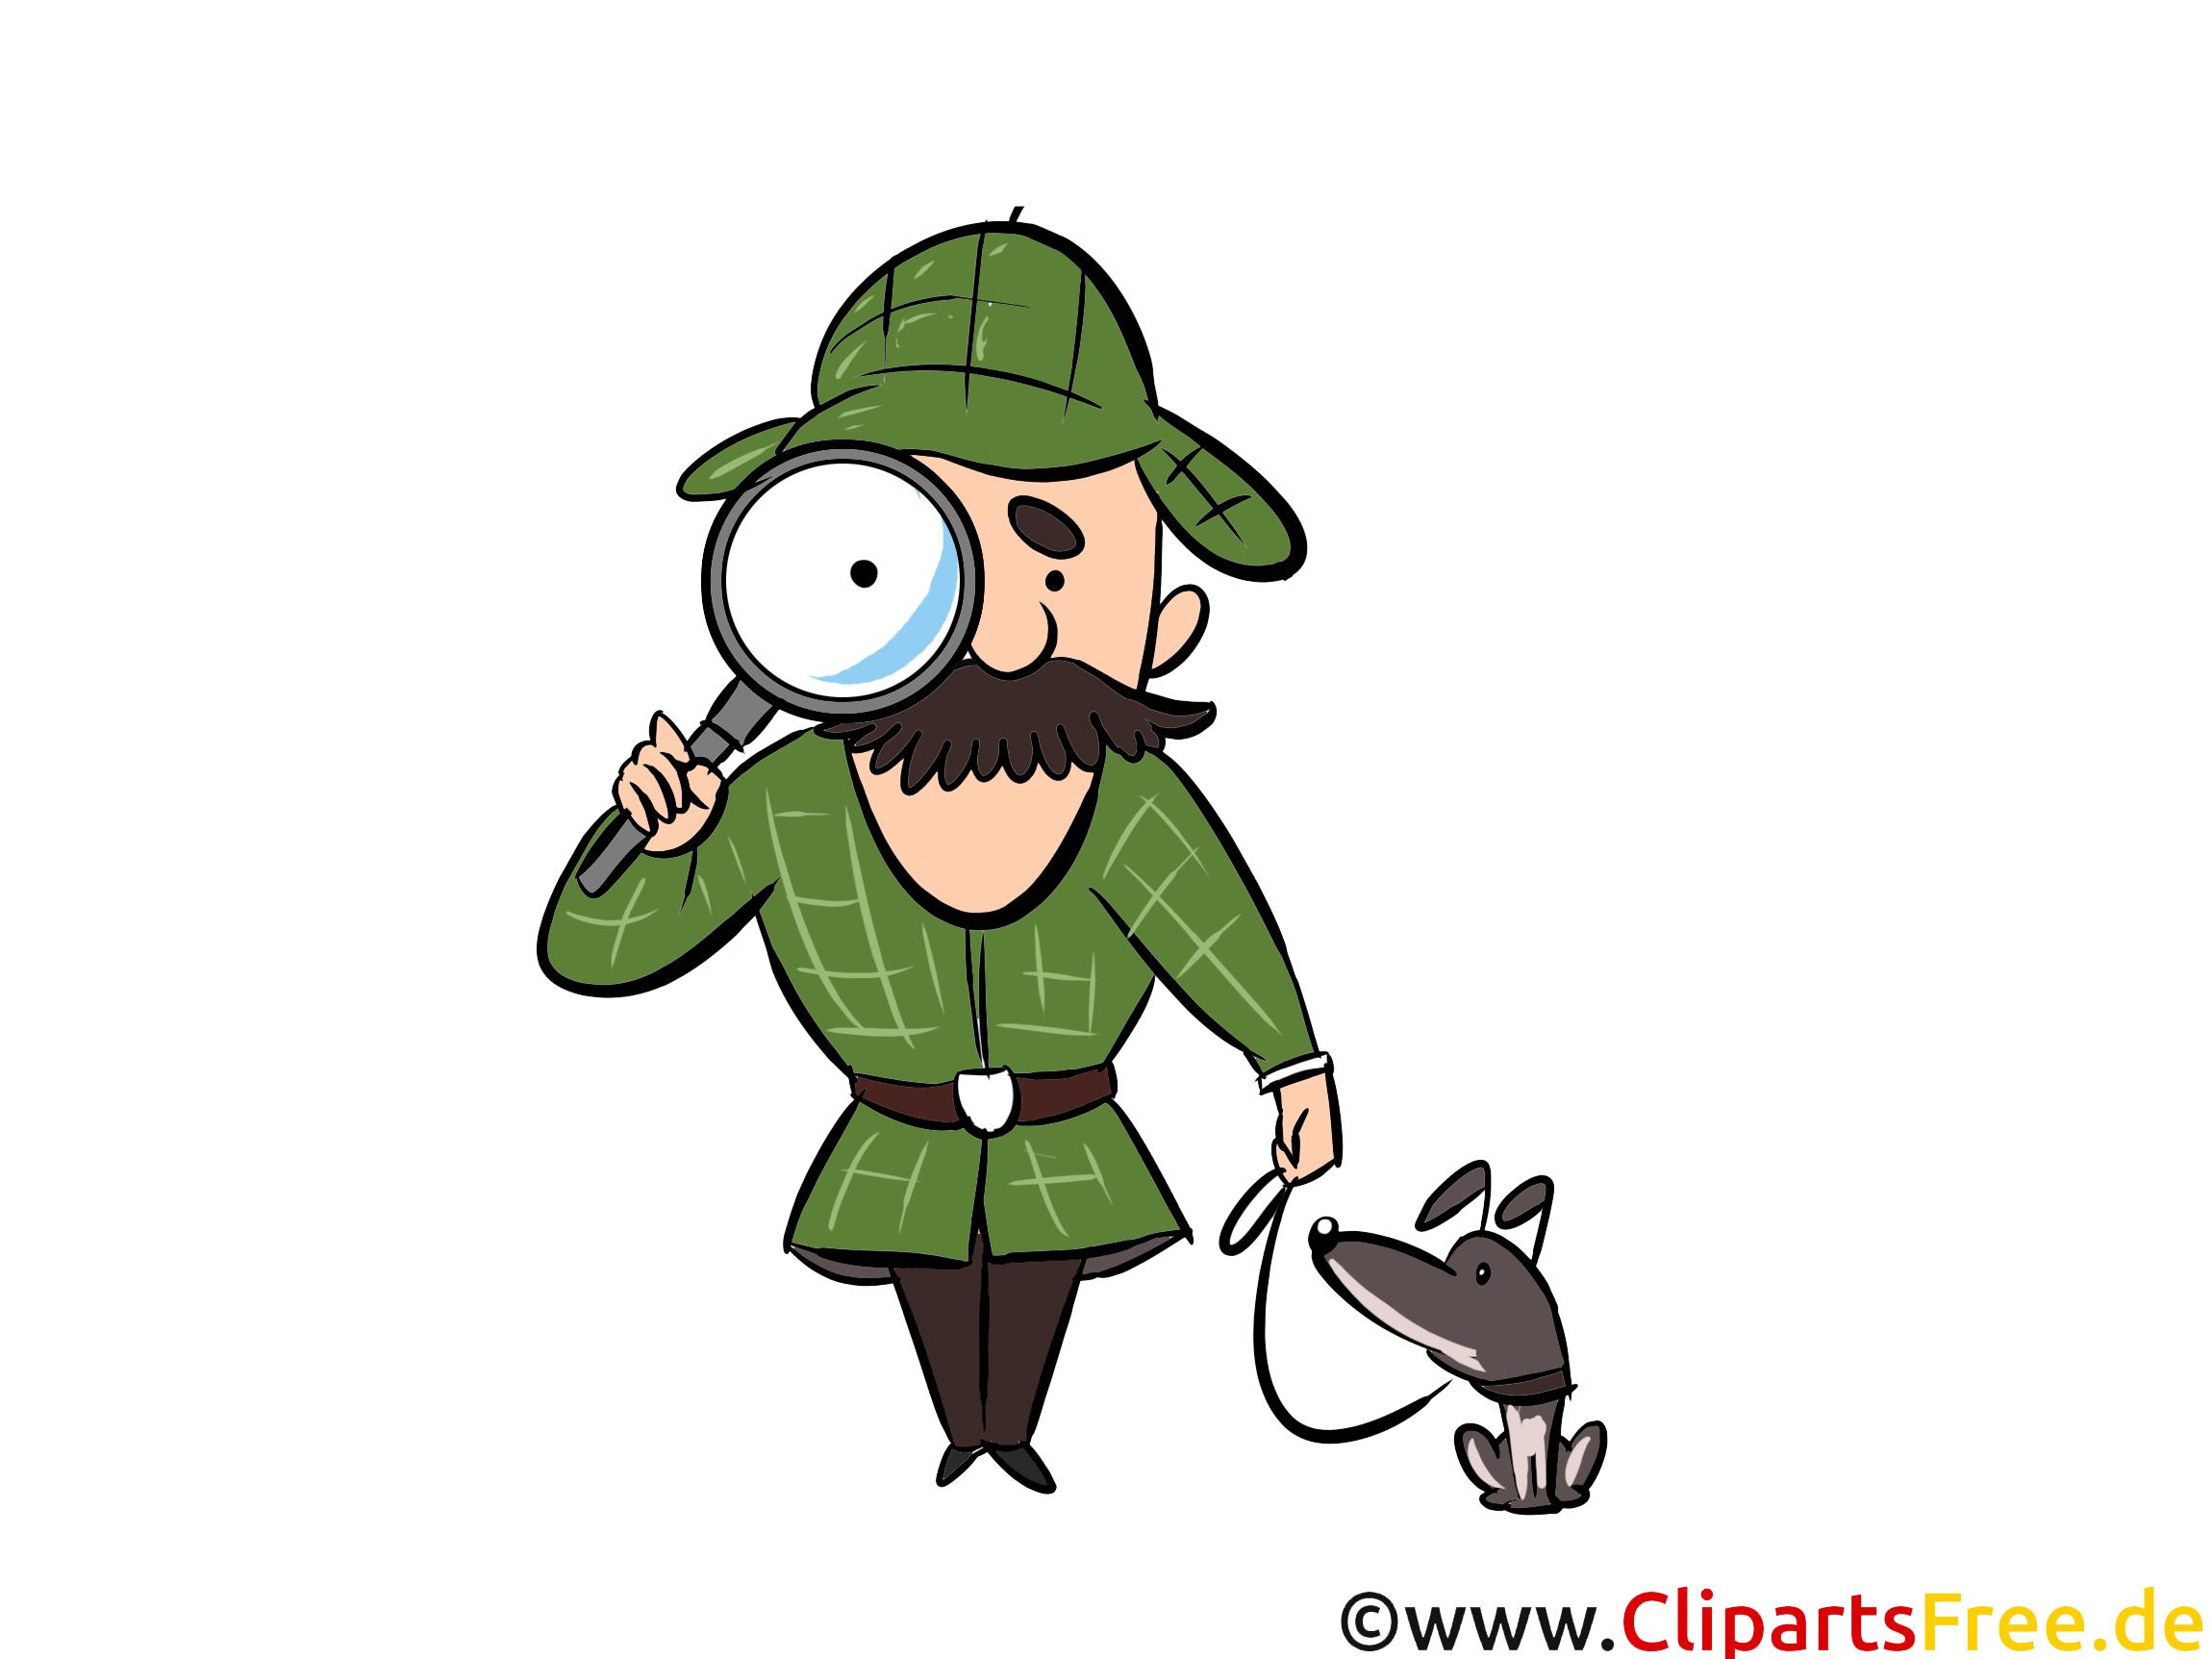 Animationsfigur Detektiv Cliparts, Bilder, Cartoons, Comis